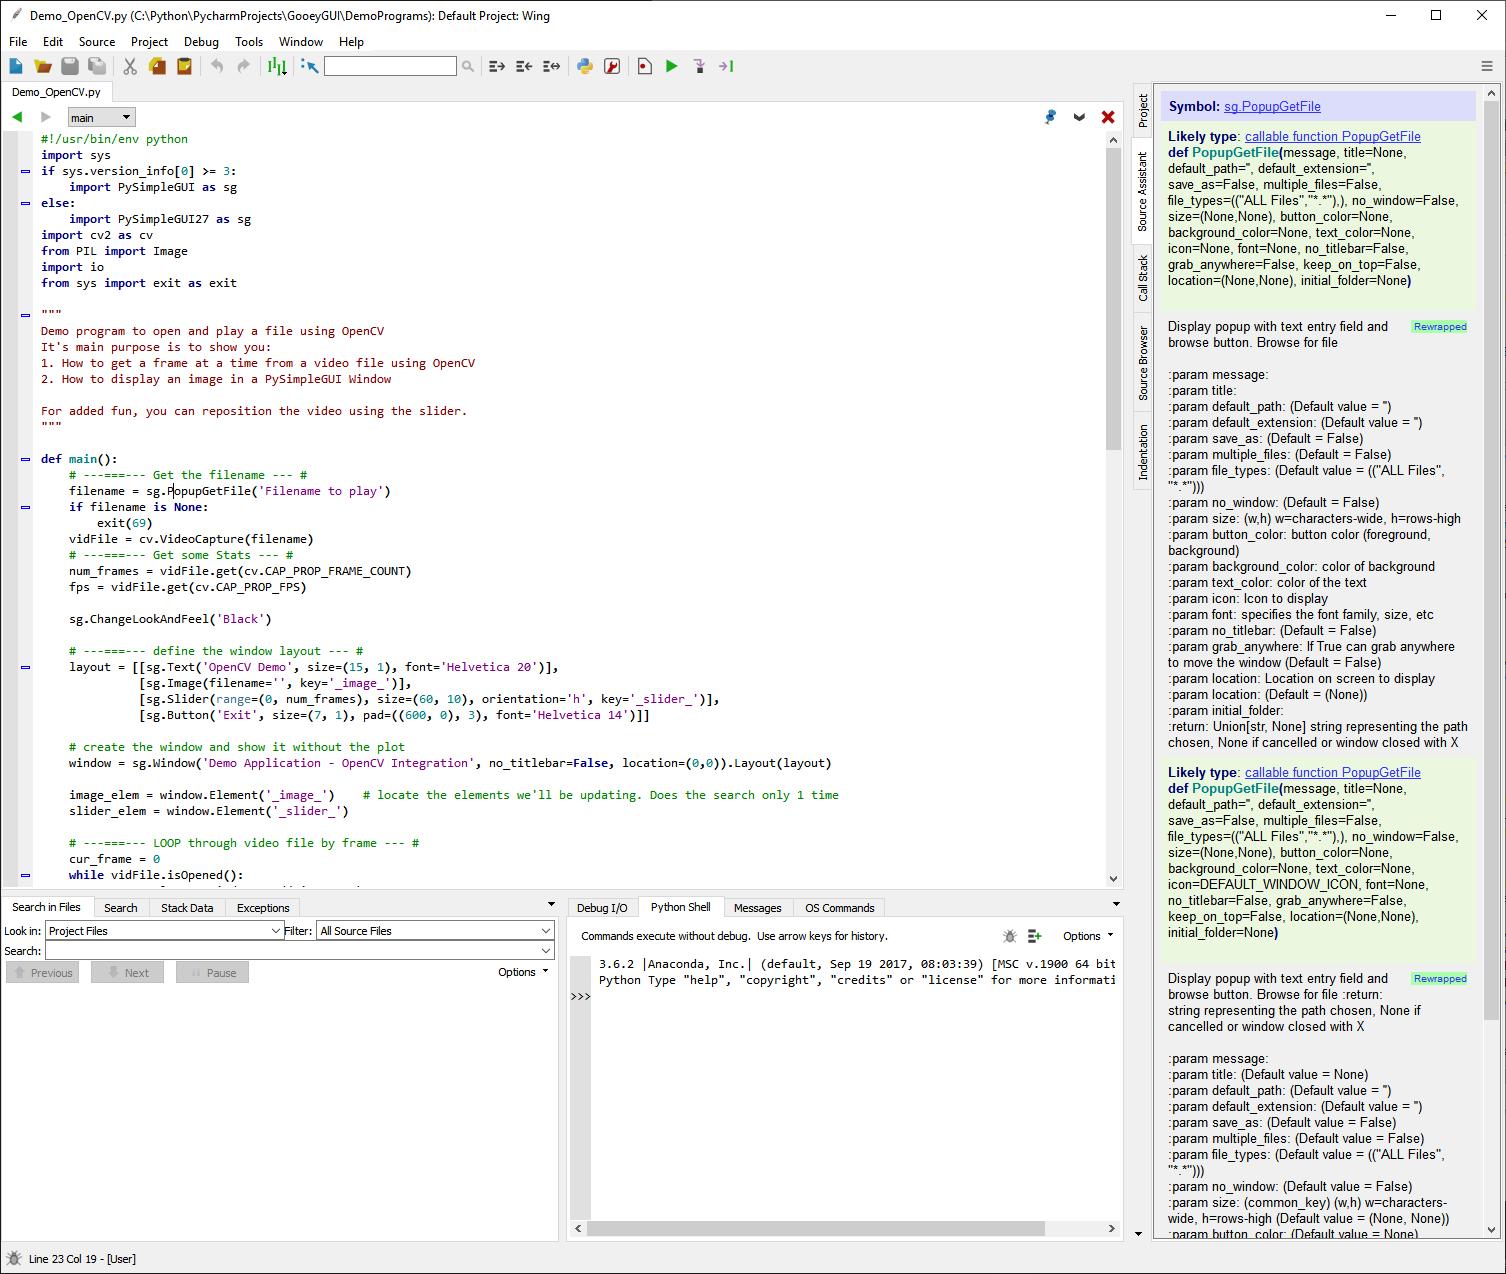 Spyder IDE causes EasyPrint debug window says to hang after